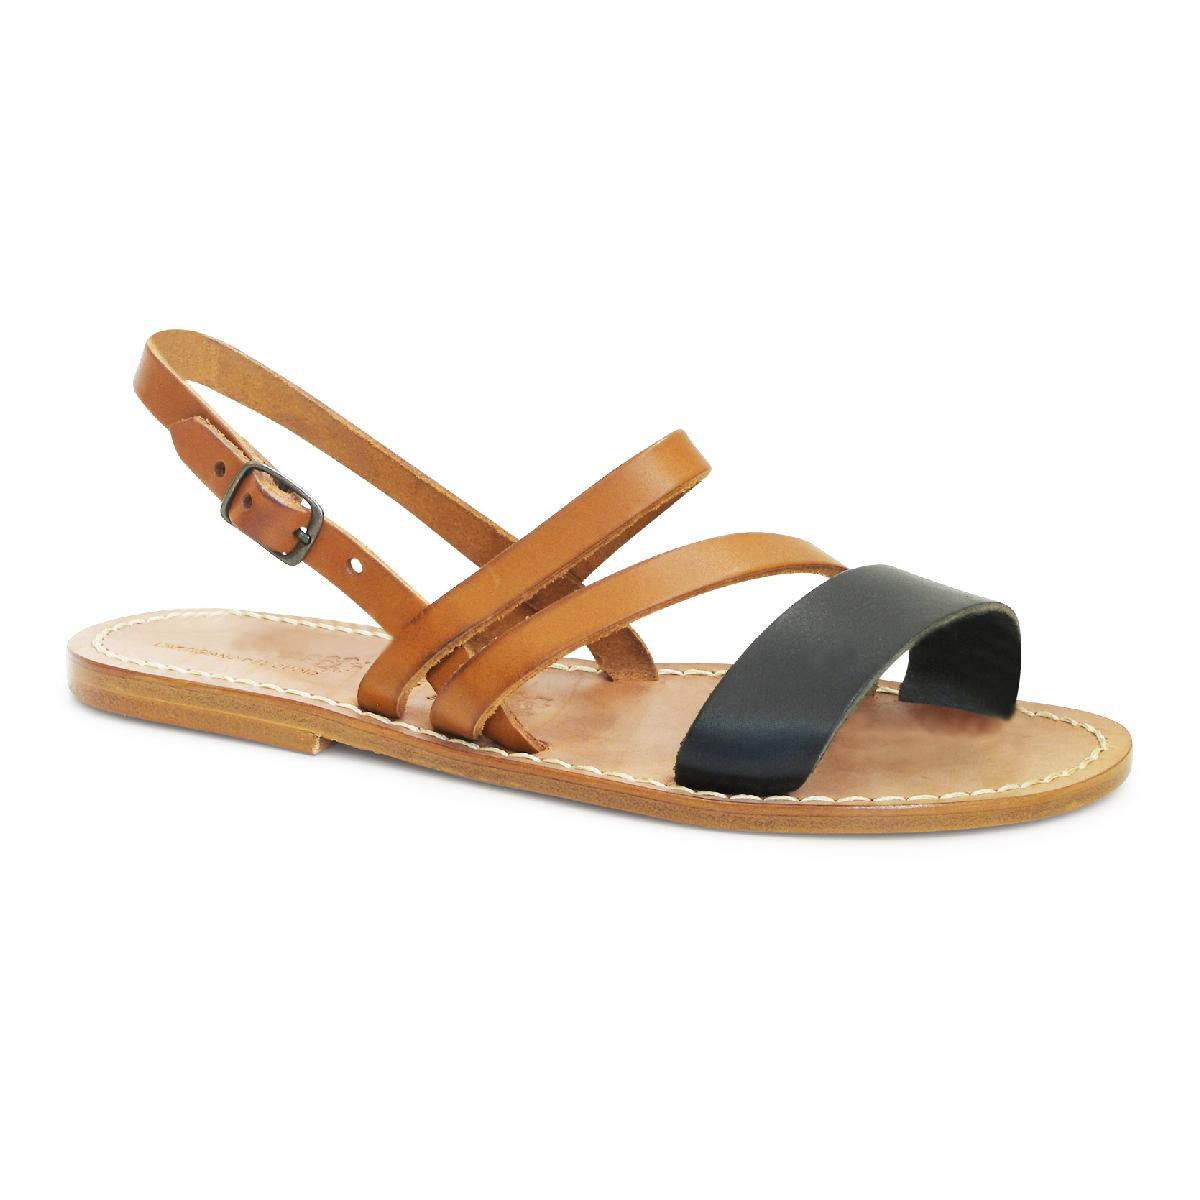 Original Ladies Leather Sandals Flat  Ladies Walking Sandals